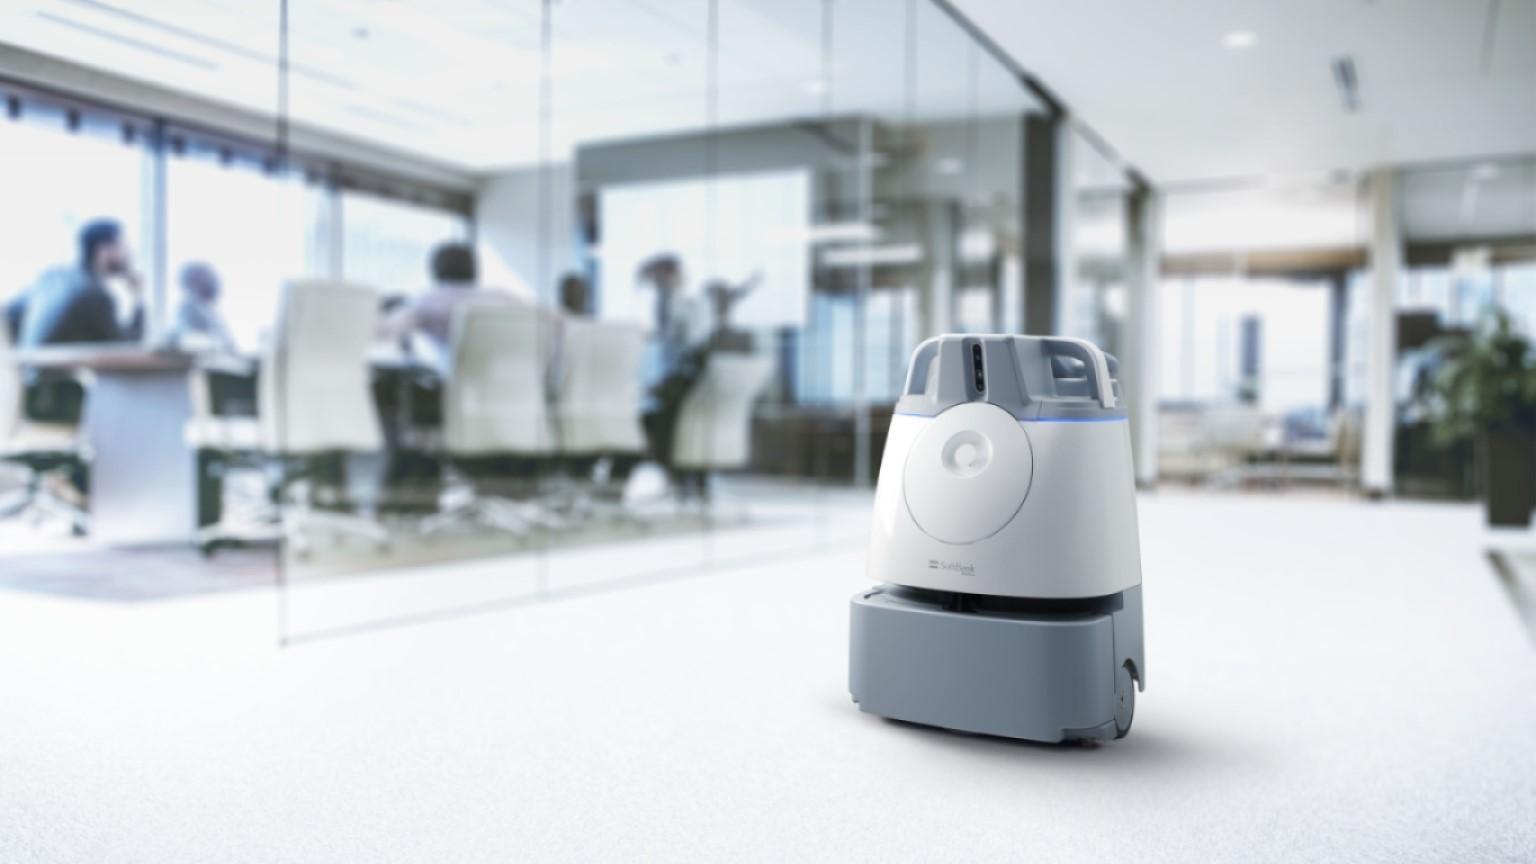 Autonomous vacuum sweeper vacuuming office hallway